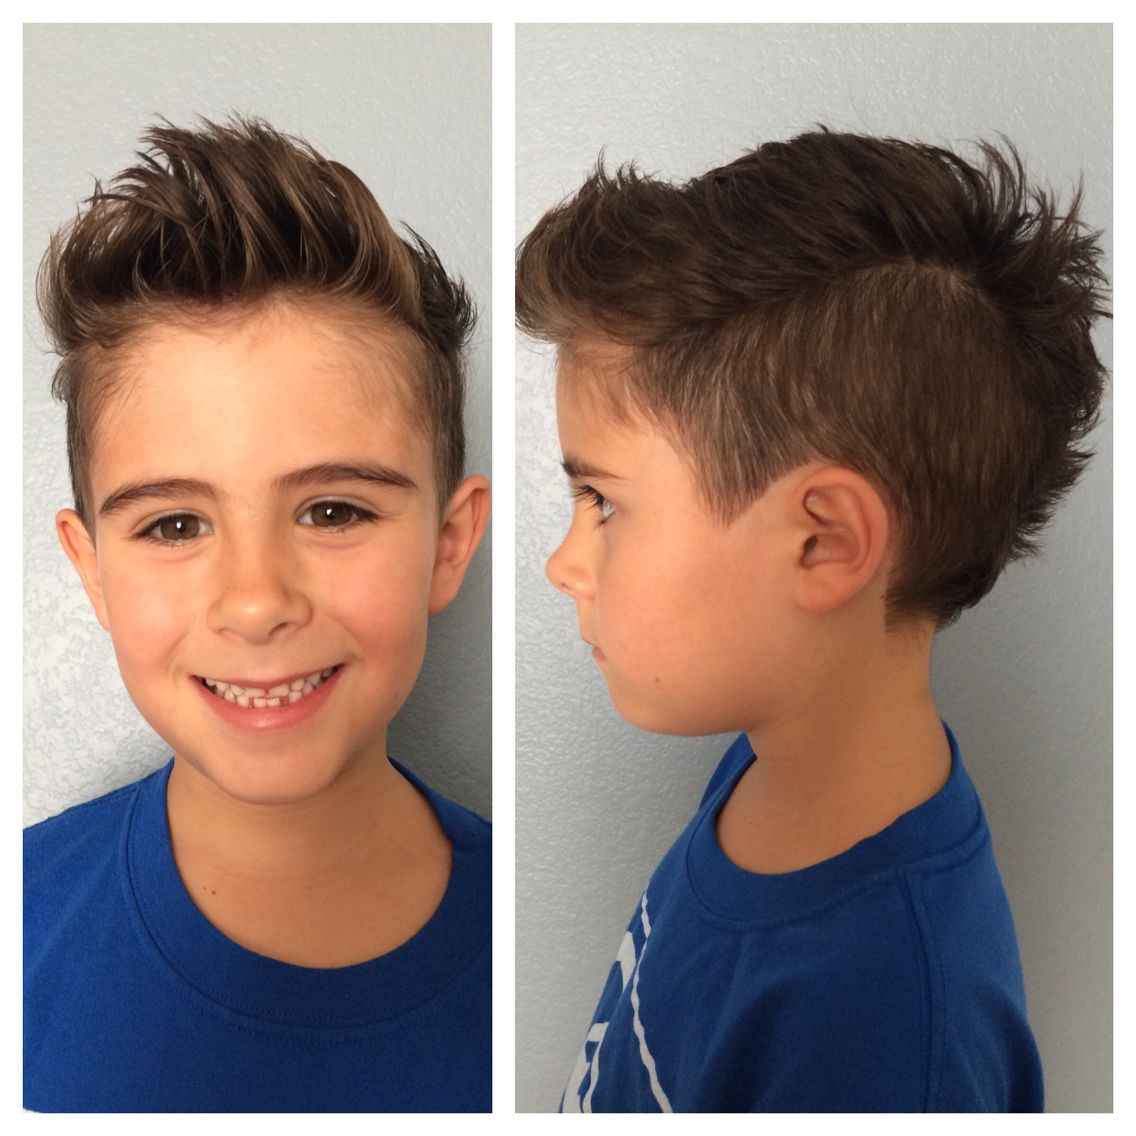 Boys haircuts   Boys haircuts, Boy hairstyles, Boys haircuts curly ...